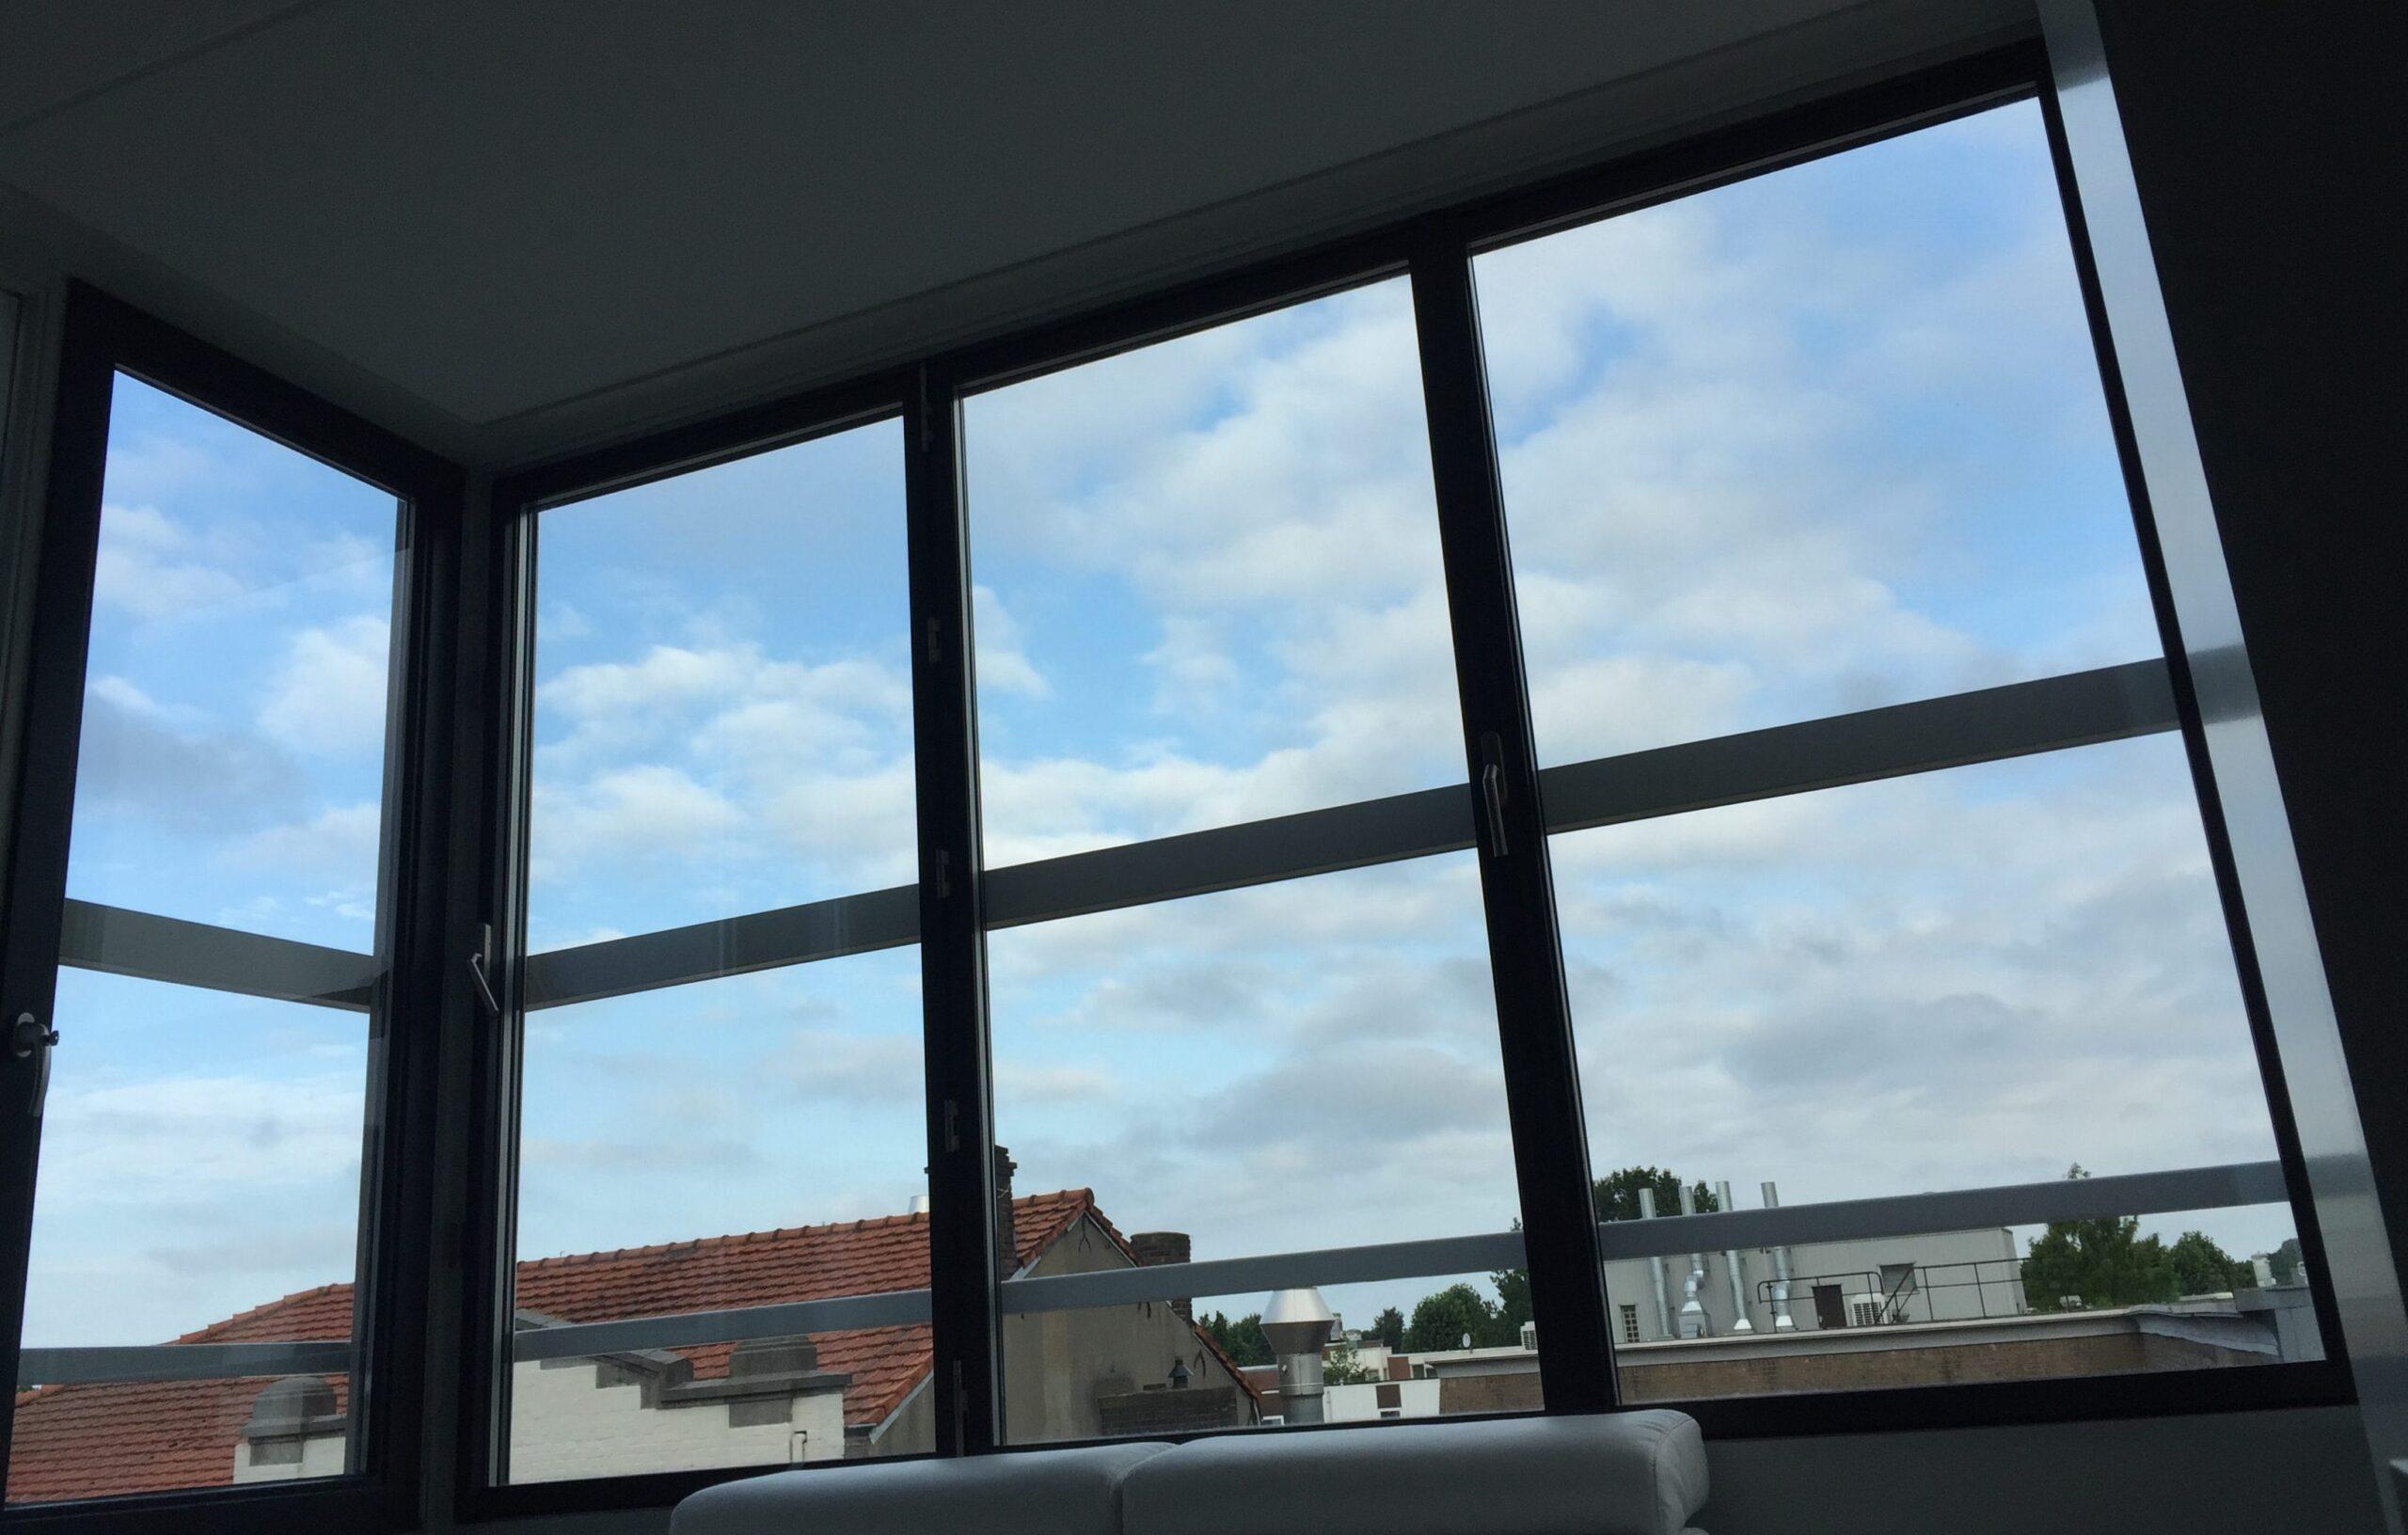 ontspannen-ochtend-raam-fibromyalgieblog